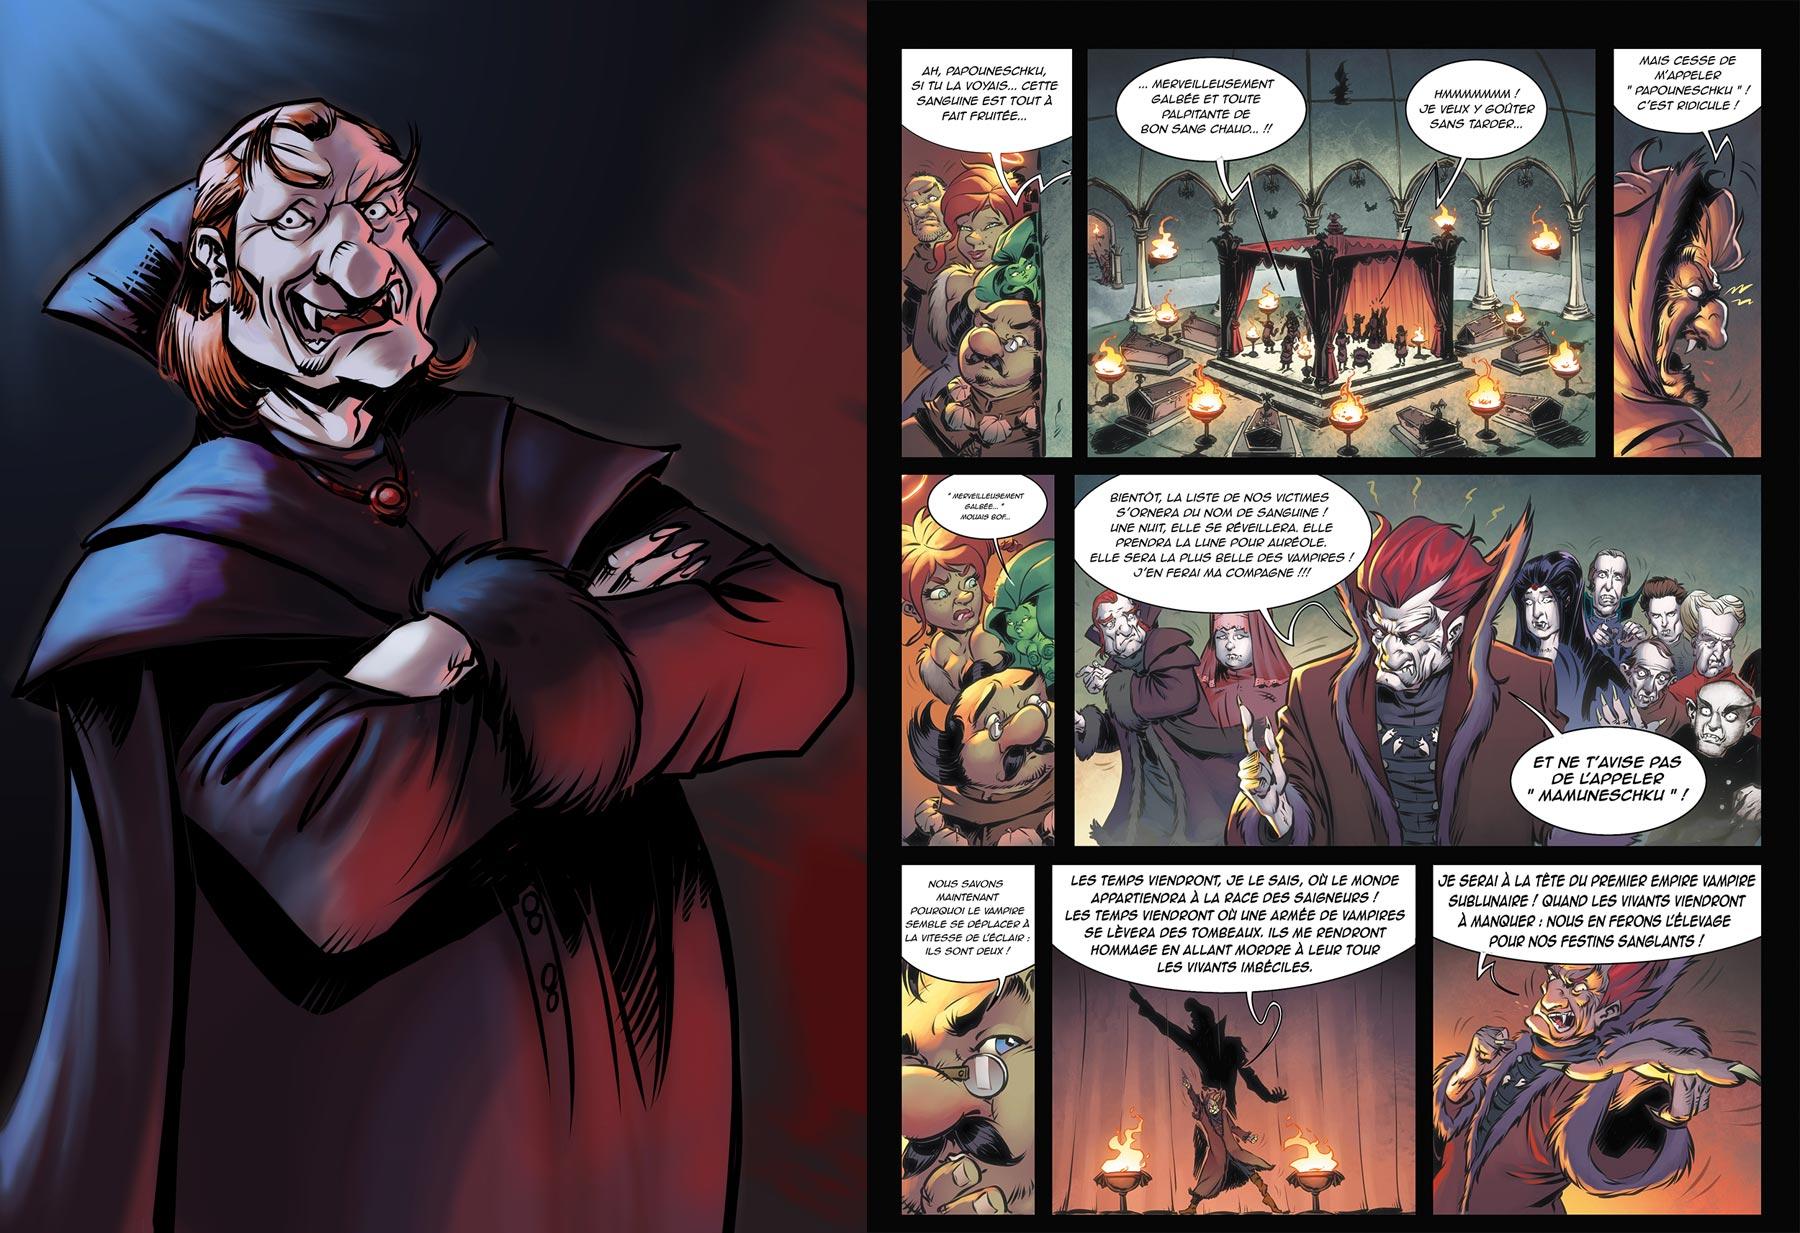 bande-dessinee-monde-medieval-humour-legende-doree-joblin-nouvel-album-vampire